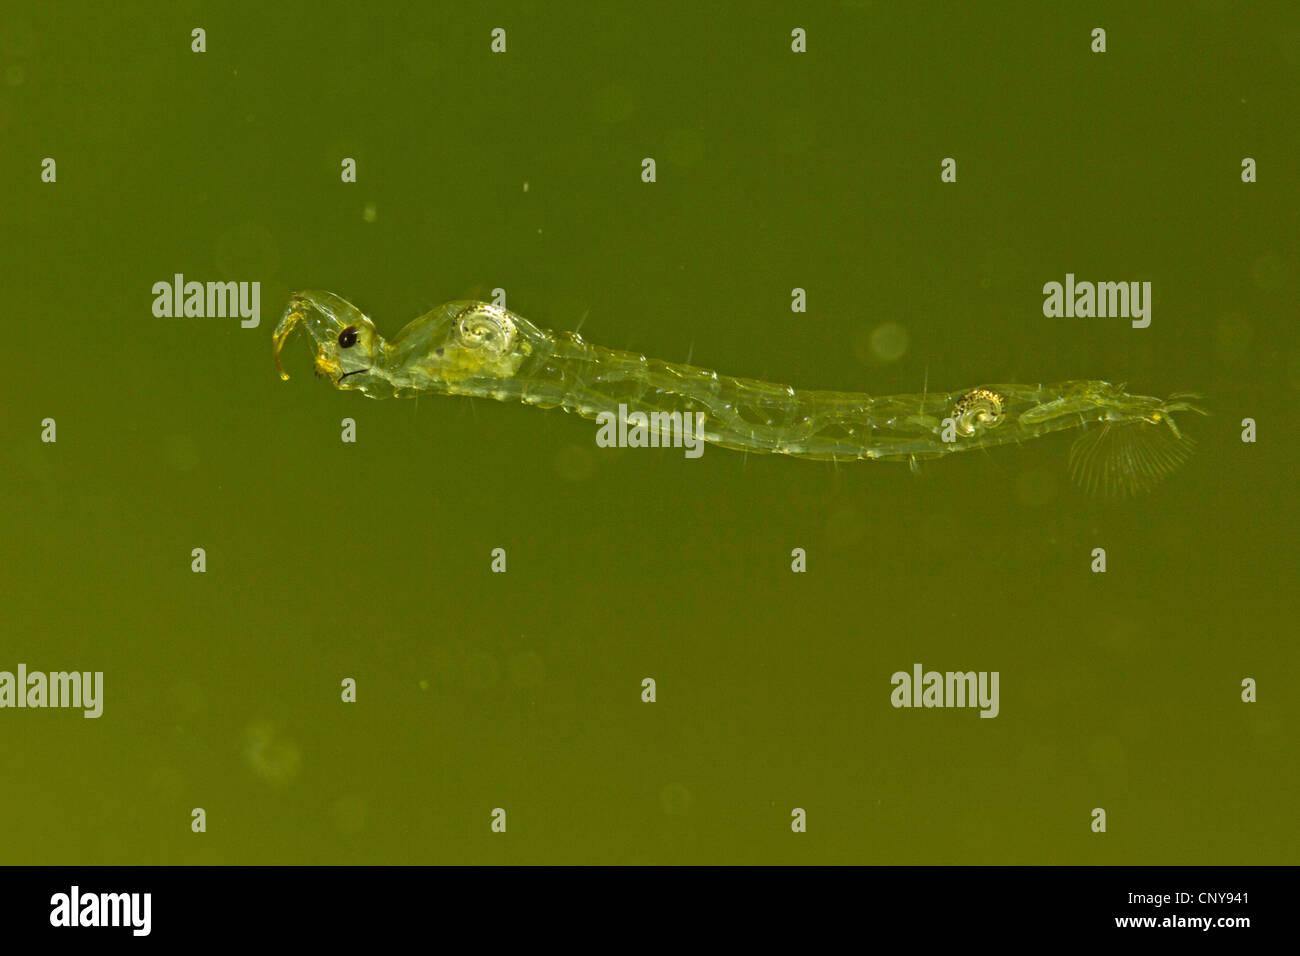 Phantom midge (Chaoborus spec.), larva floating in the water - Stock Image